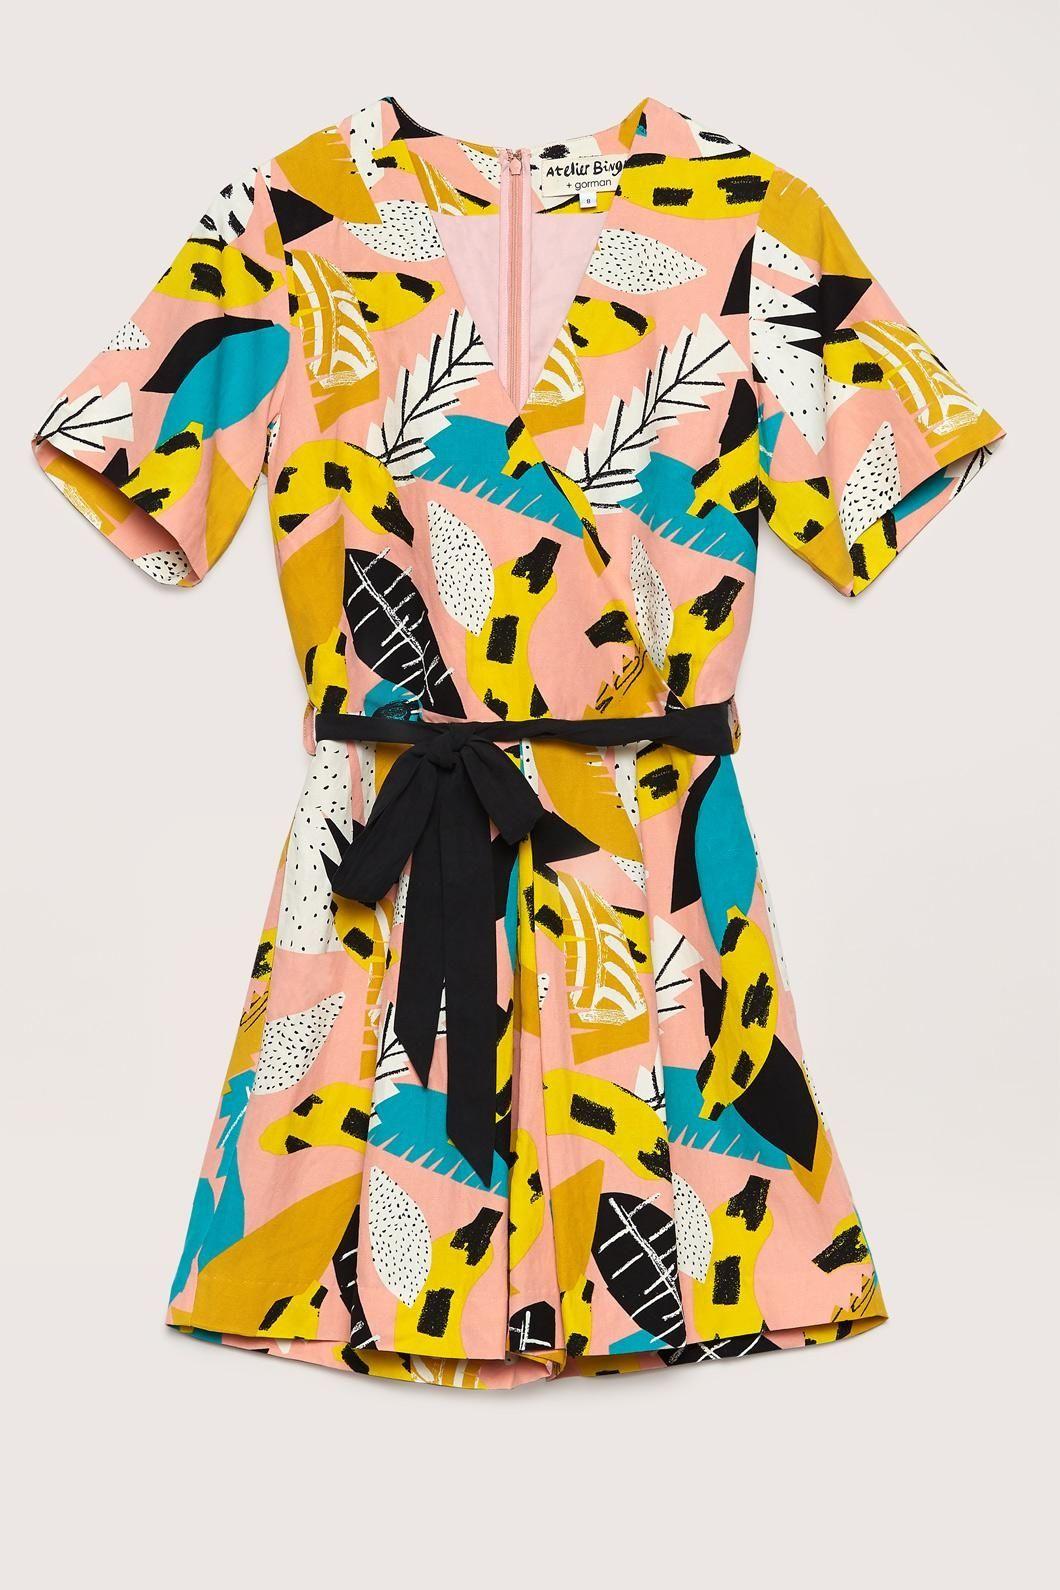 atelier bingo x gorman clothing | Gorman clothing, Fashion ...